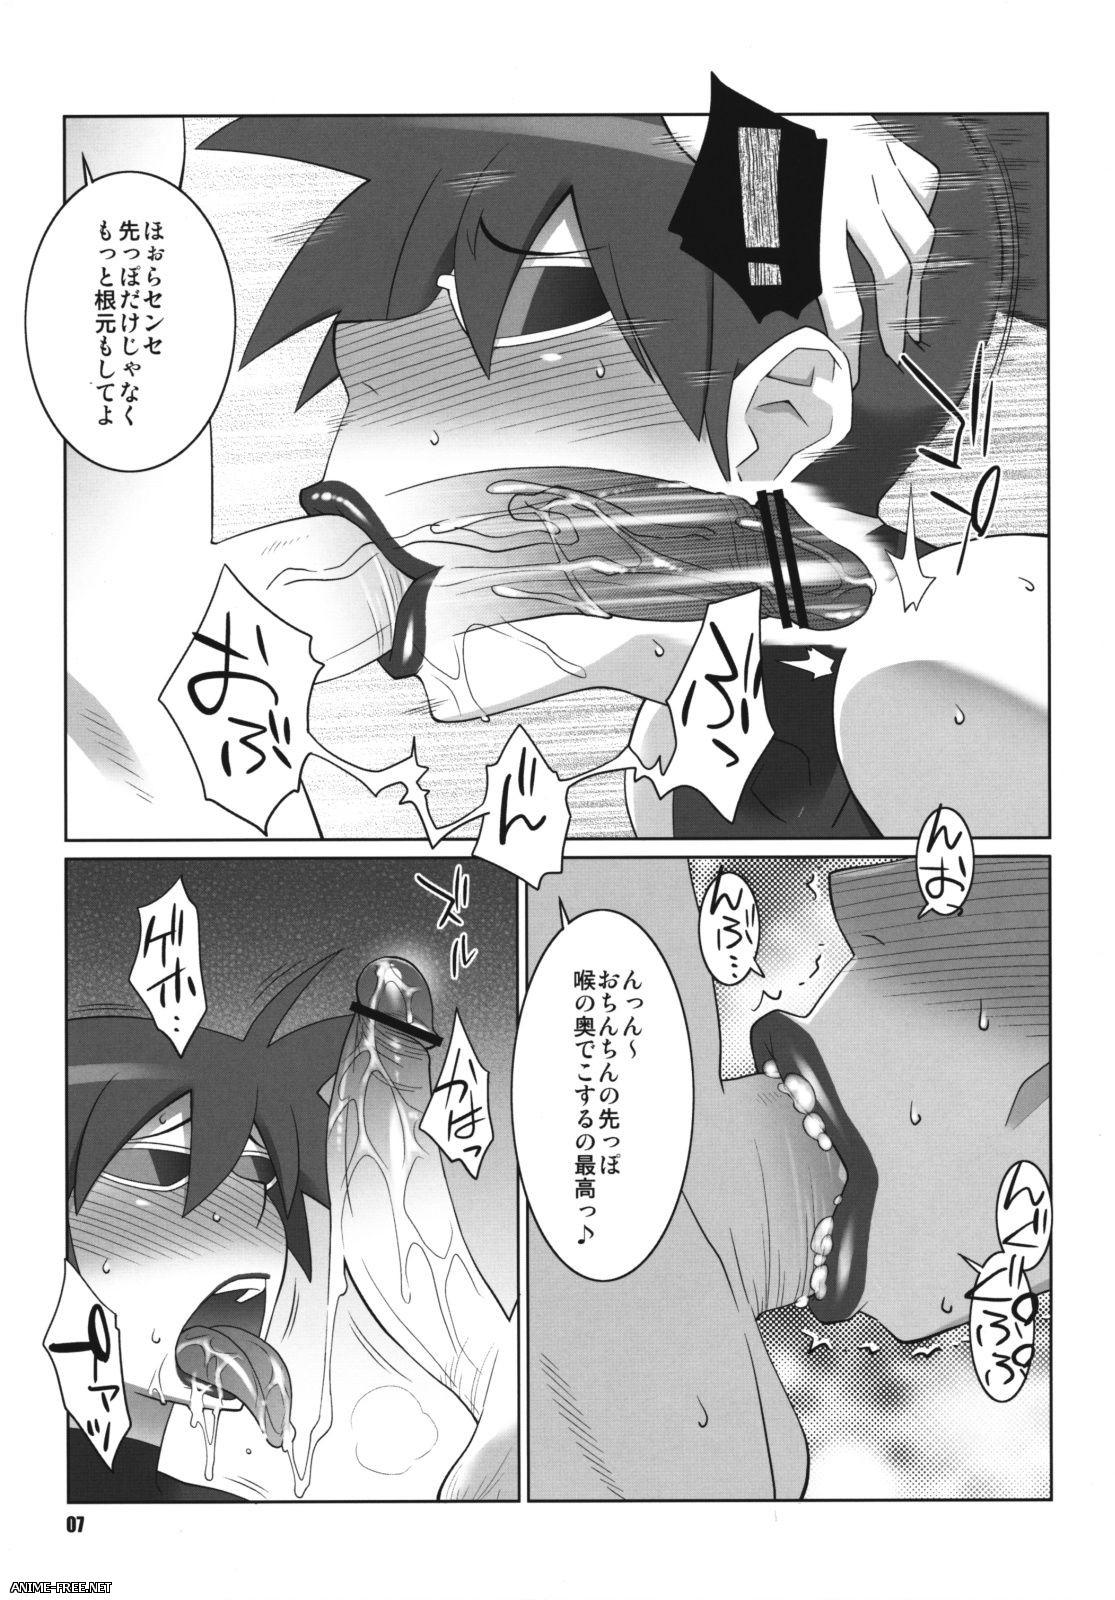 Nise Kurosaki / Tetrodotoxin — Сборник хентай манги [Ptcen] [RUS,ENG,JAP] Manga Hentai